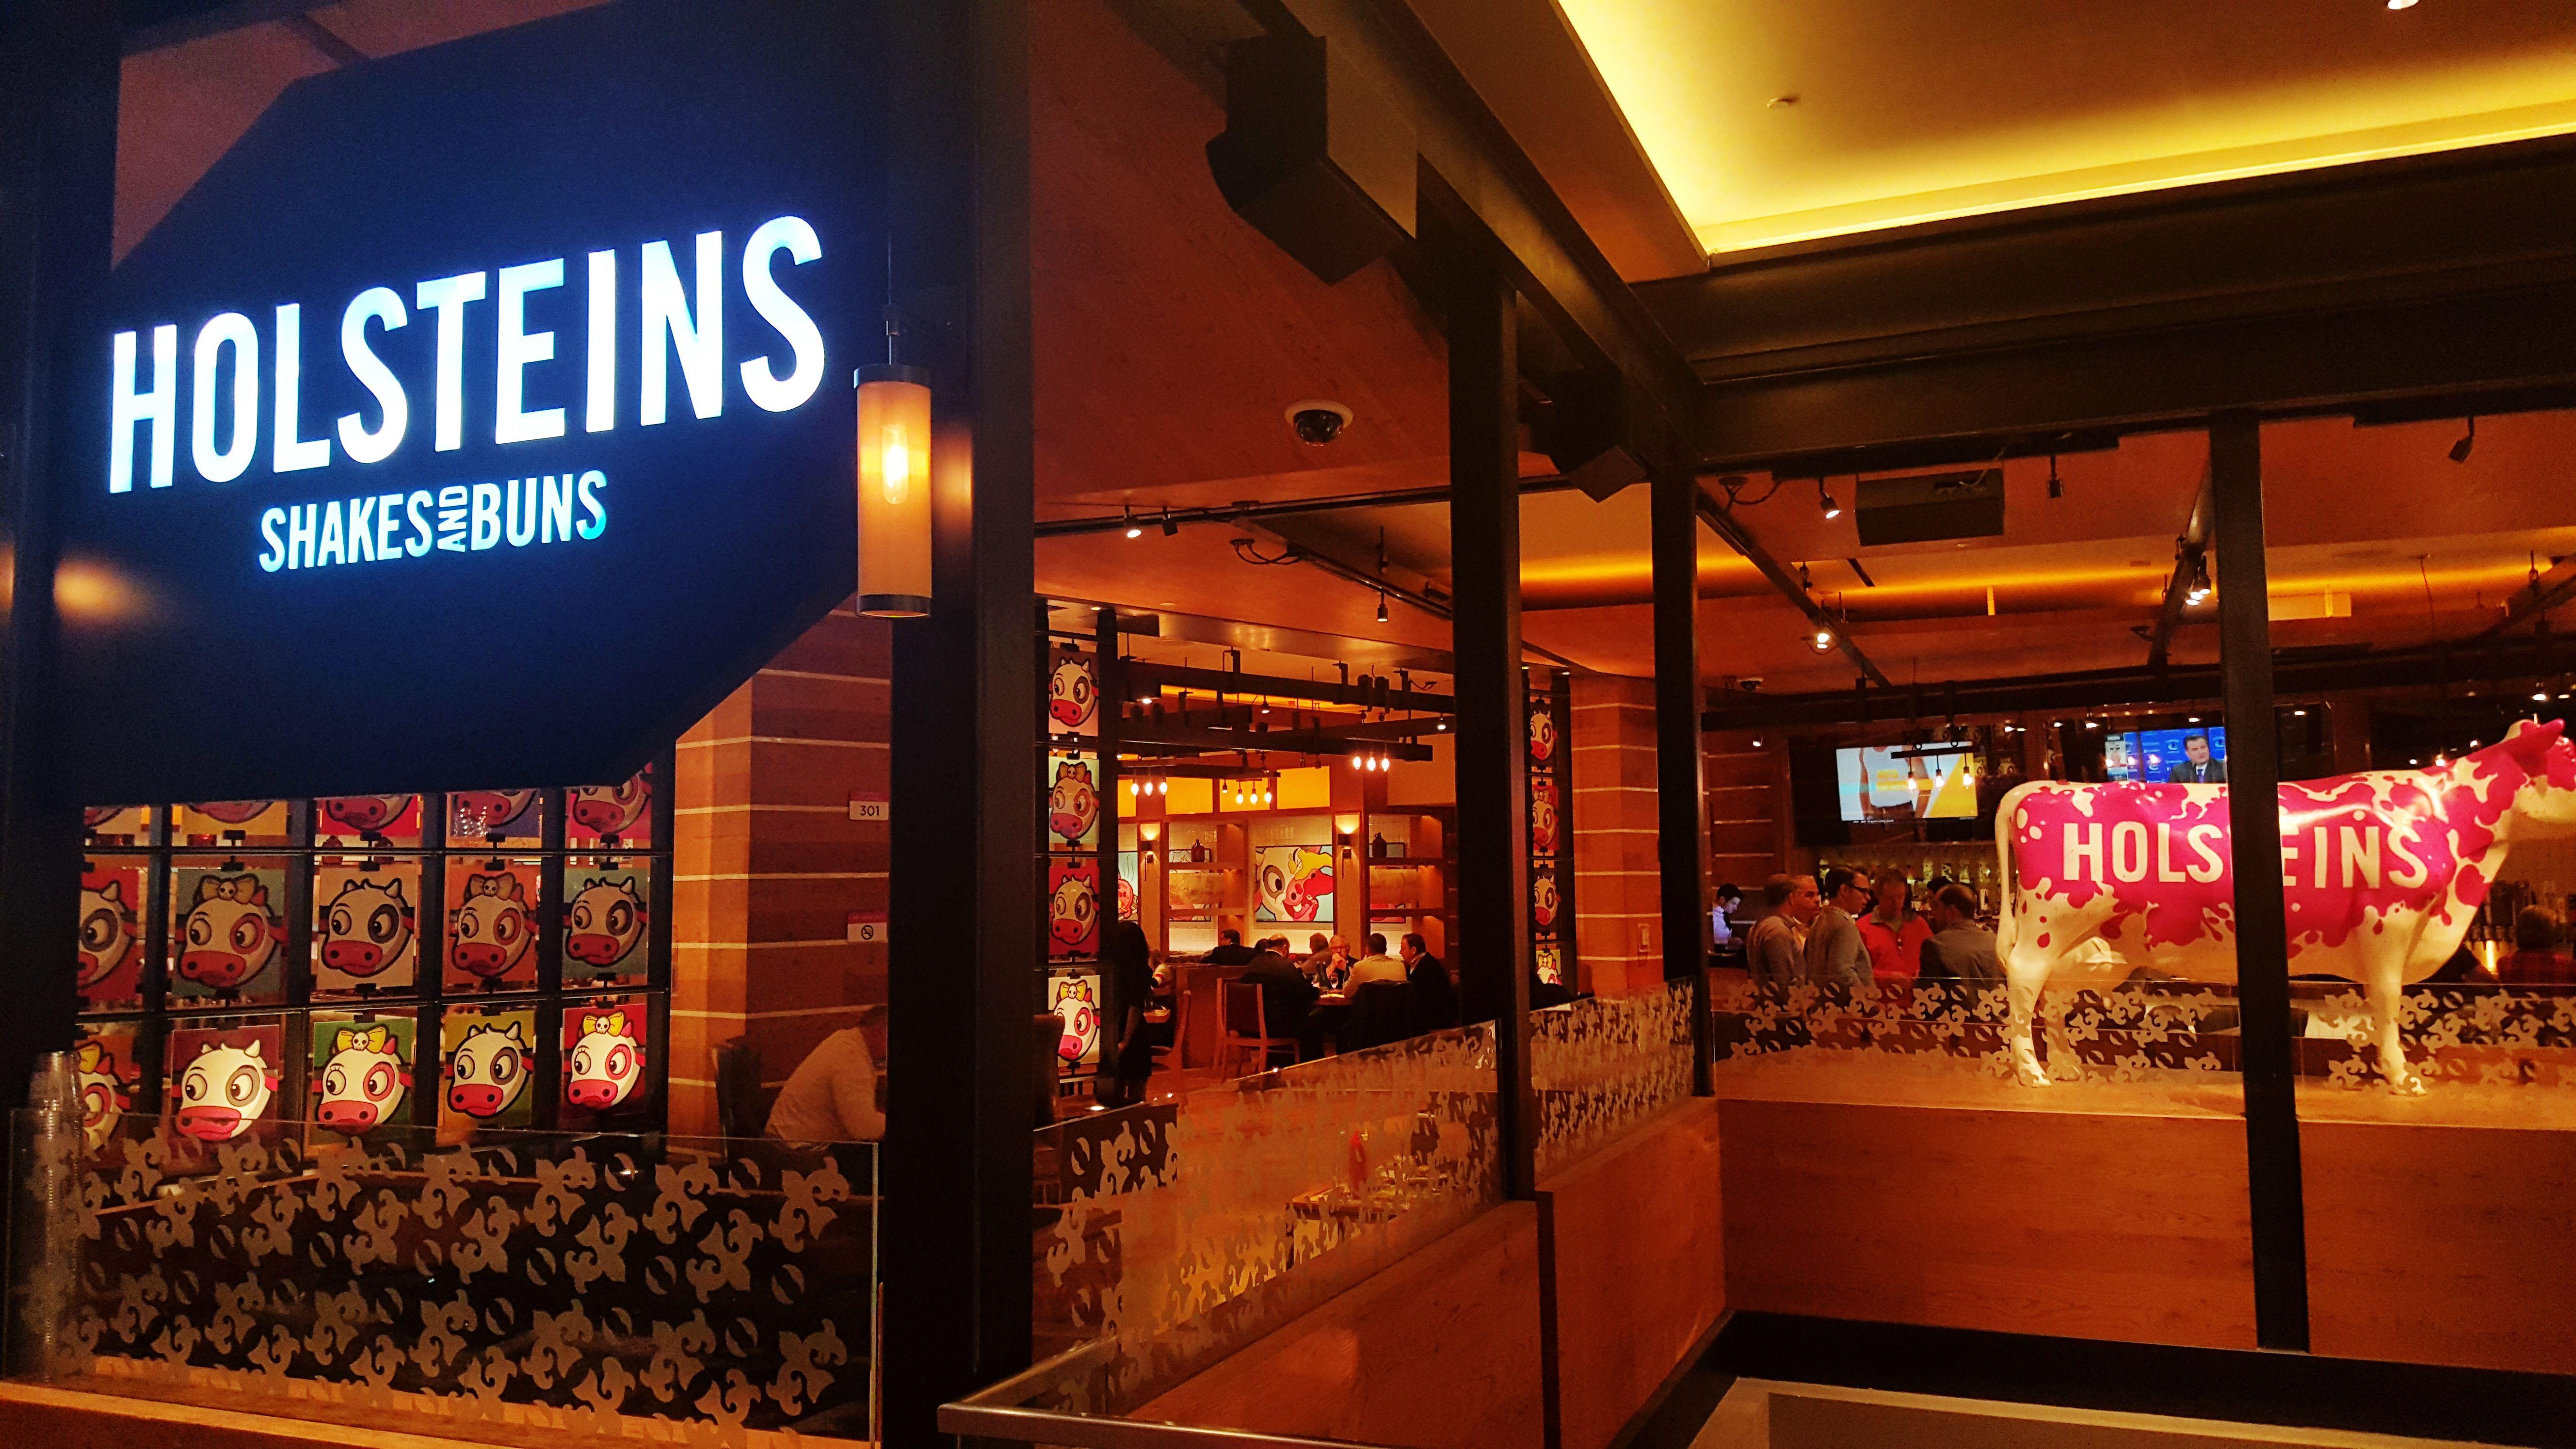 Holsteins Shakes and Buns at Cosmopolitan Las Vegas